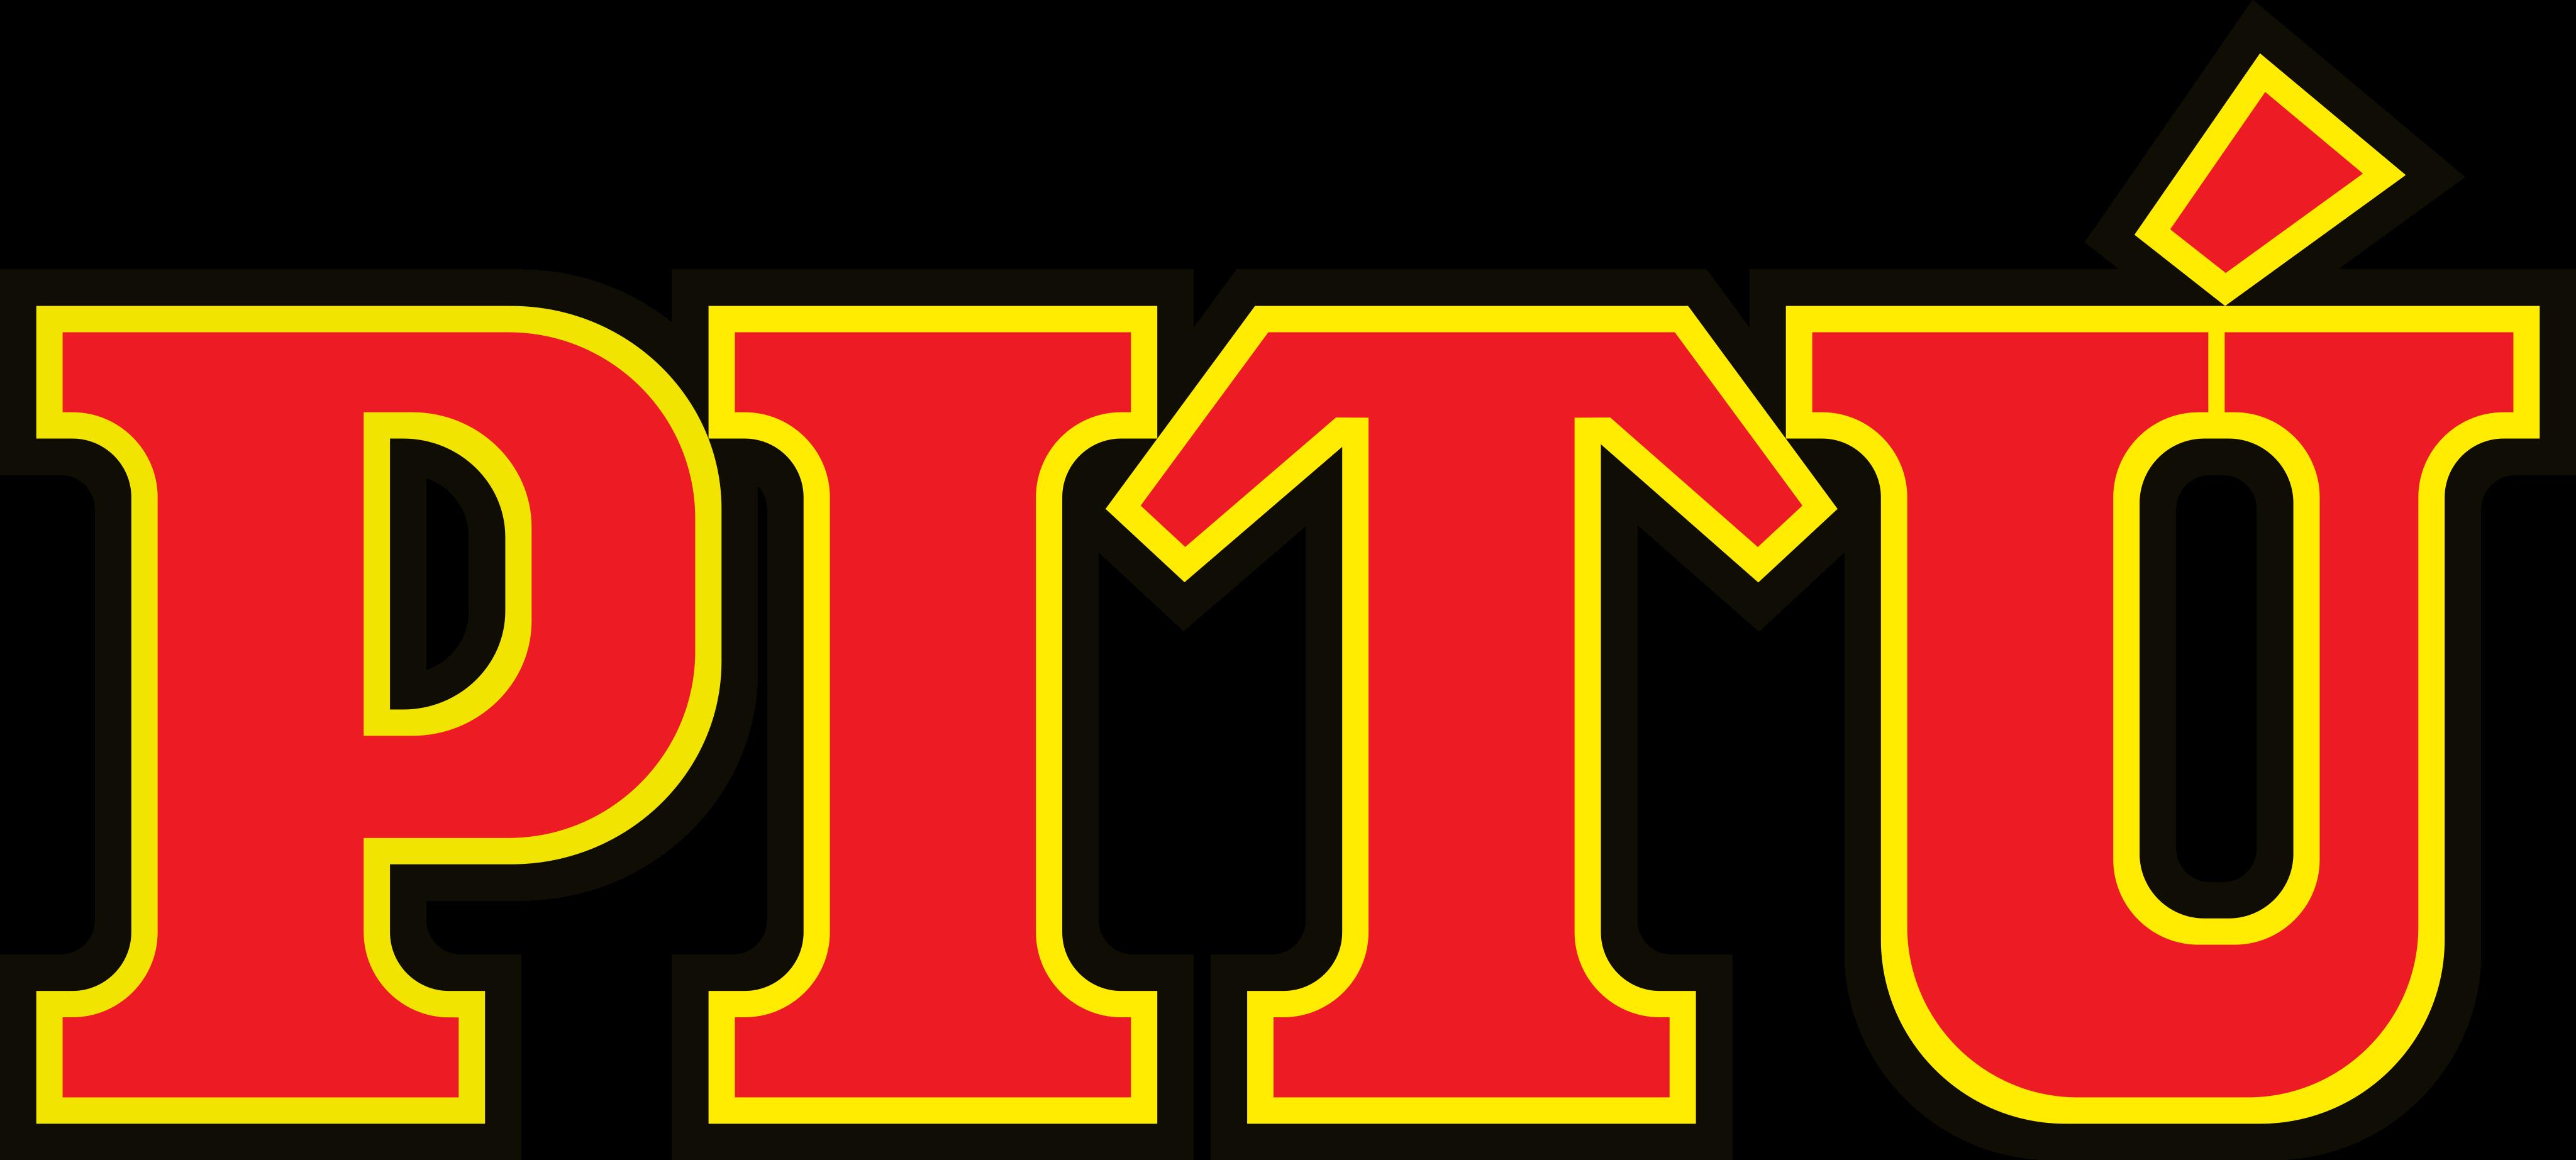 pitu logo 1 - Pitu Logo